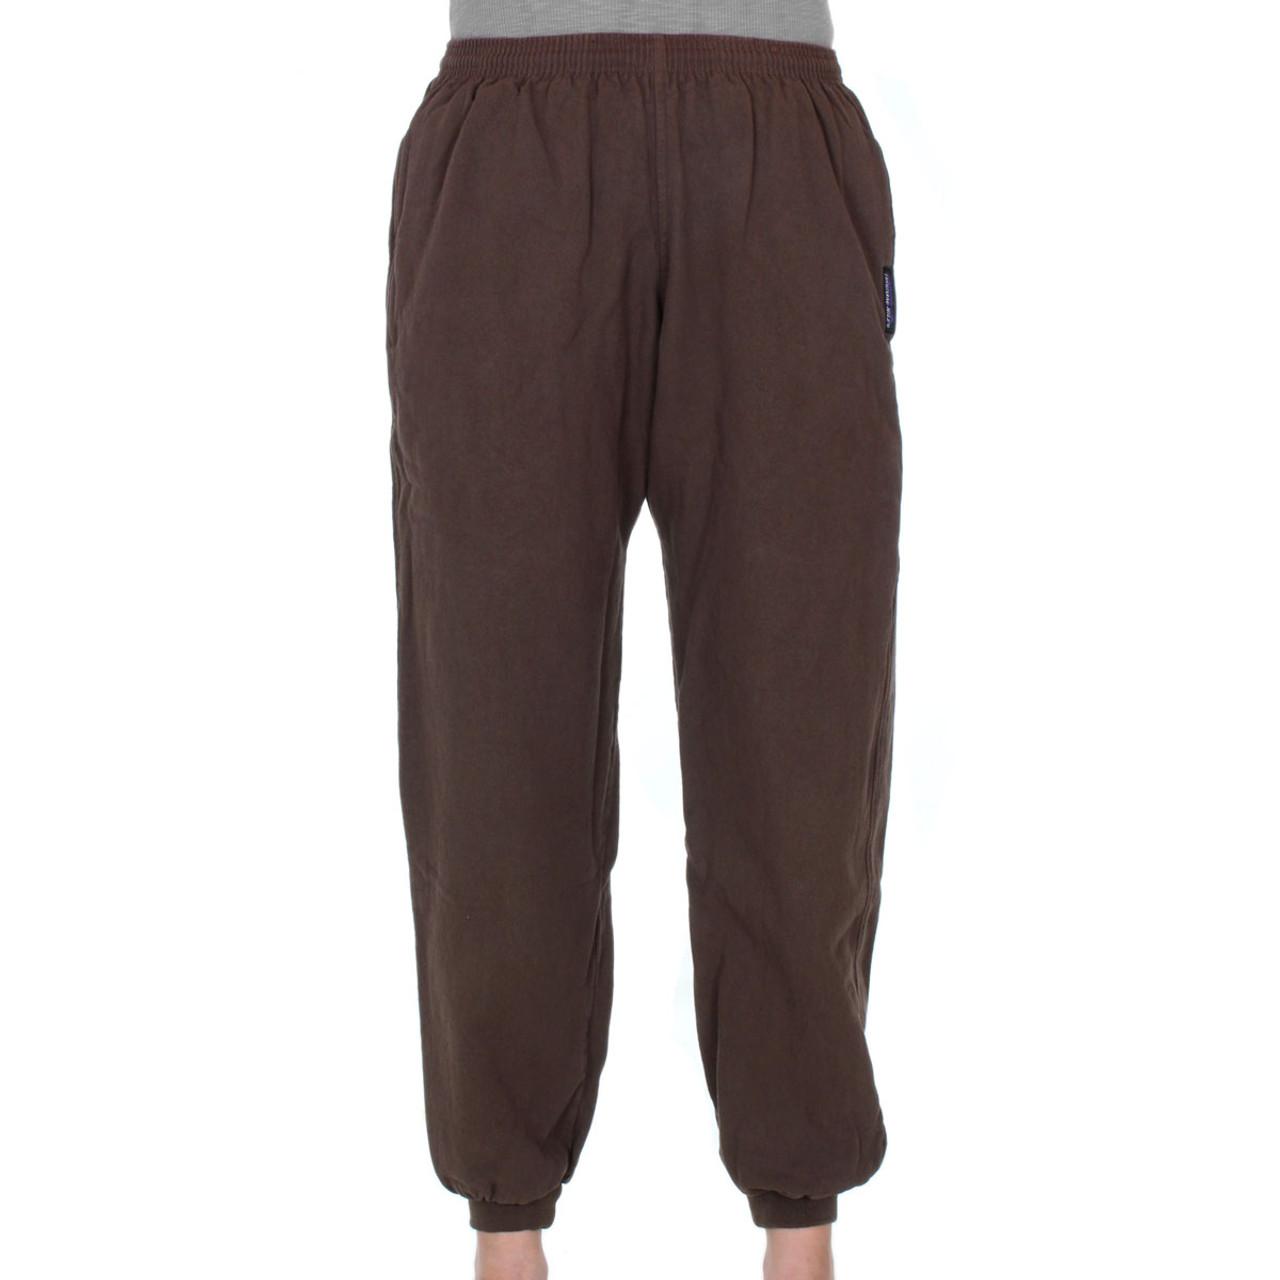 cc2e596f Previous. Womens All-Cotton Beefy 8 oz CUFFED SWEAT PANTS ...